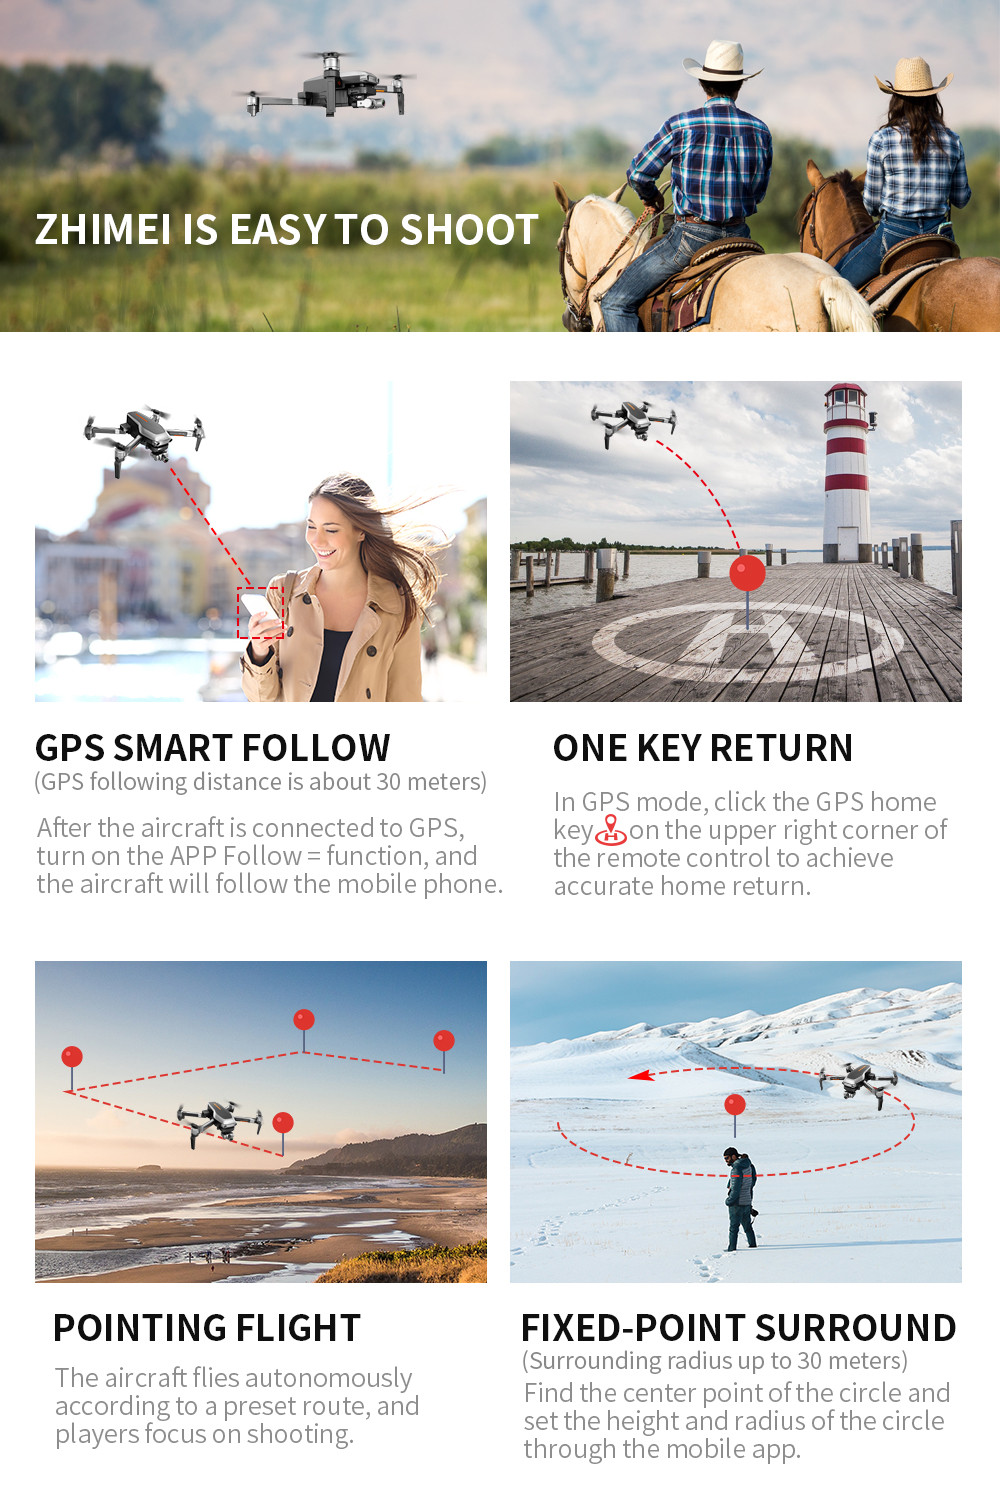 Person - L109PRO GPS Drone 4K Quadcopter HD ESC Camera Brushless 5G WiFi FPV HD ESC Camera Brushless Helicopter Long Flight Time